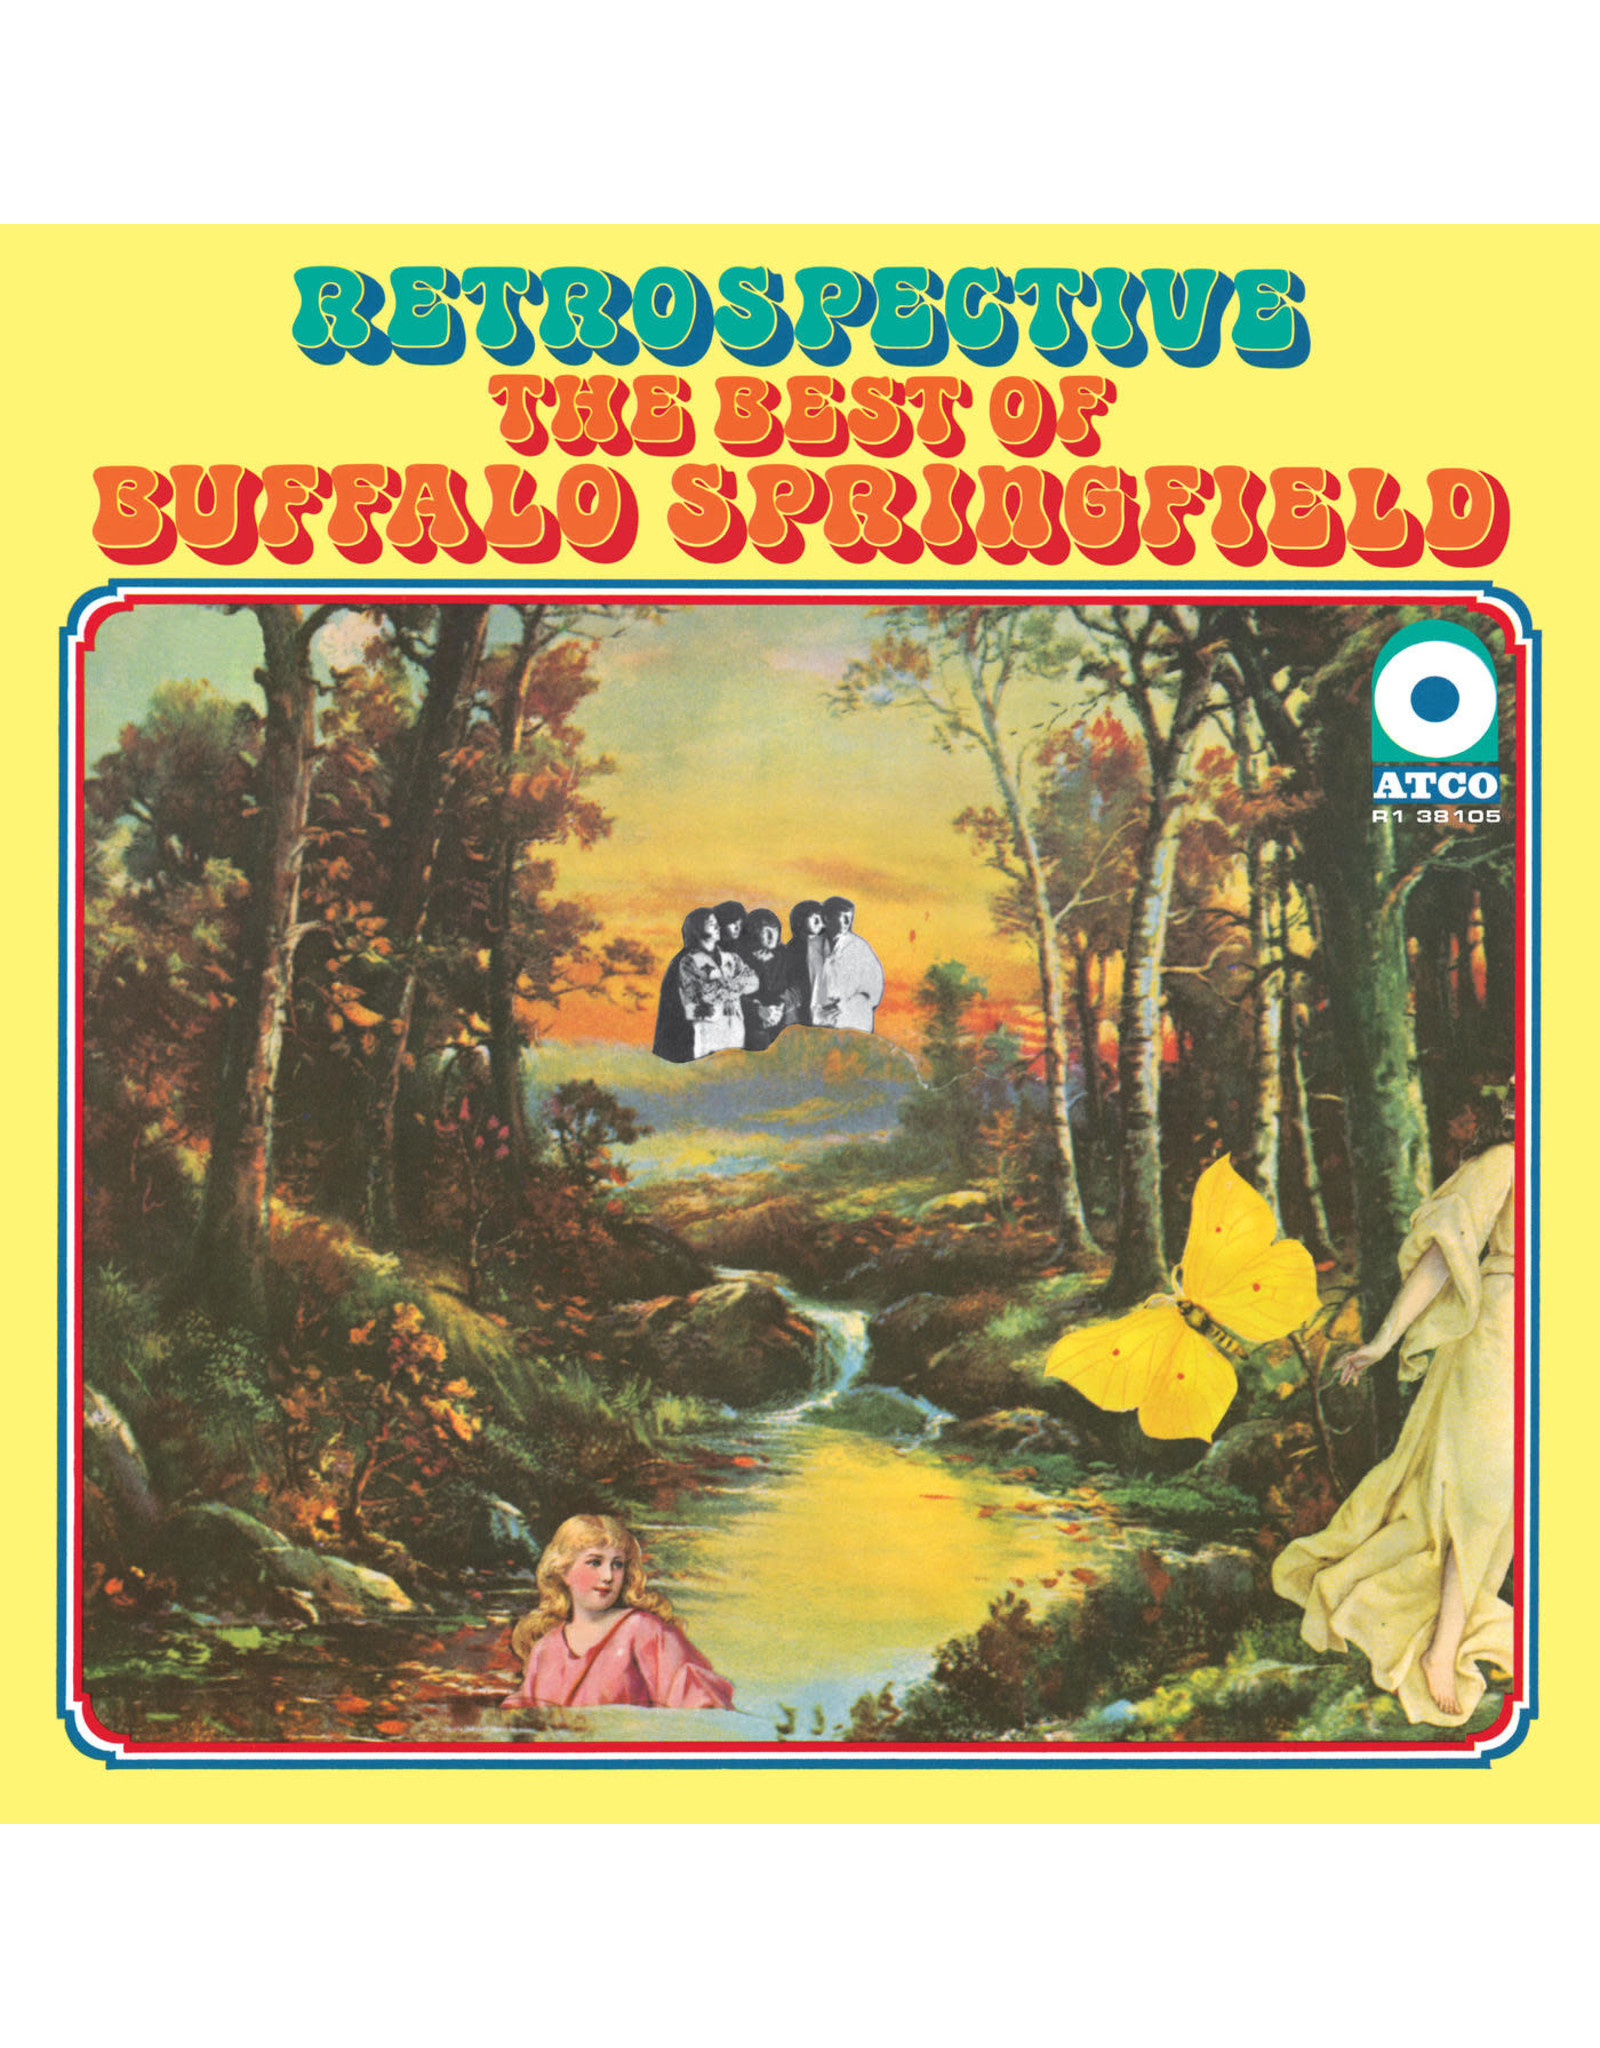 Buffalo Springfield - Retrospective: The Best Of Buffalo Springfield